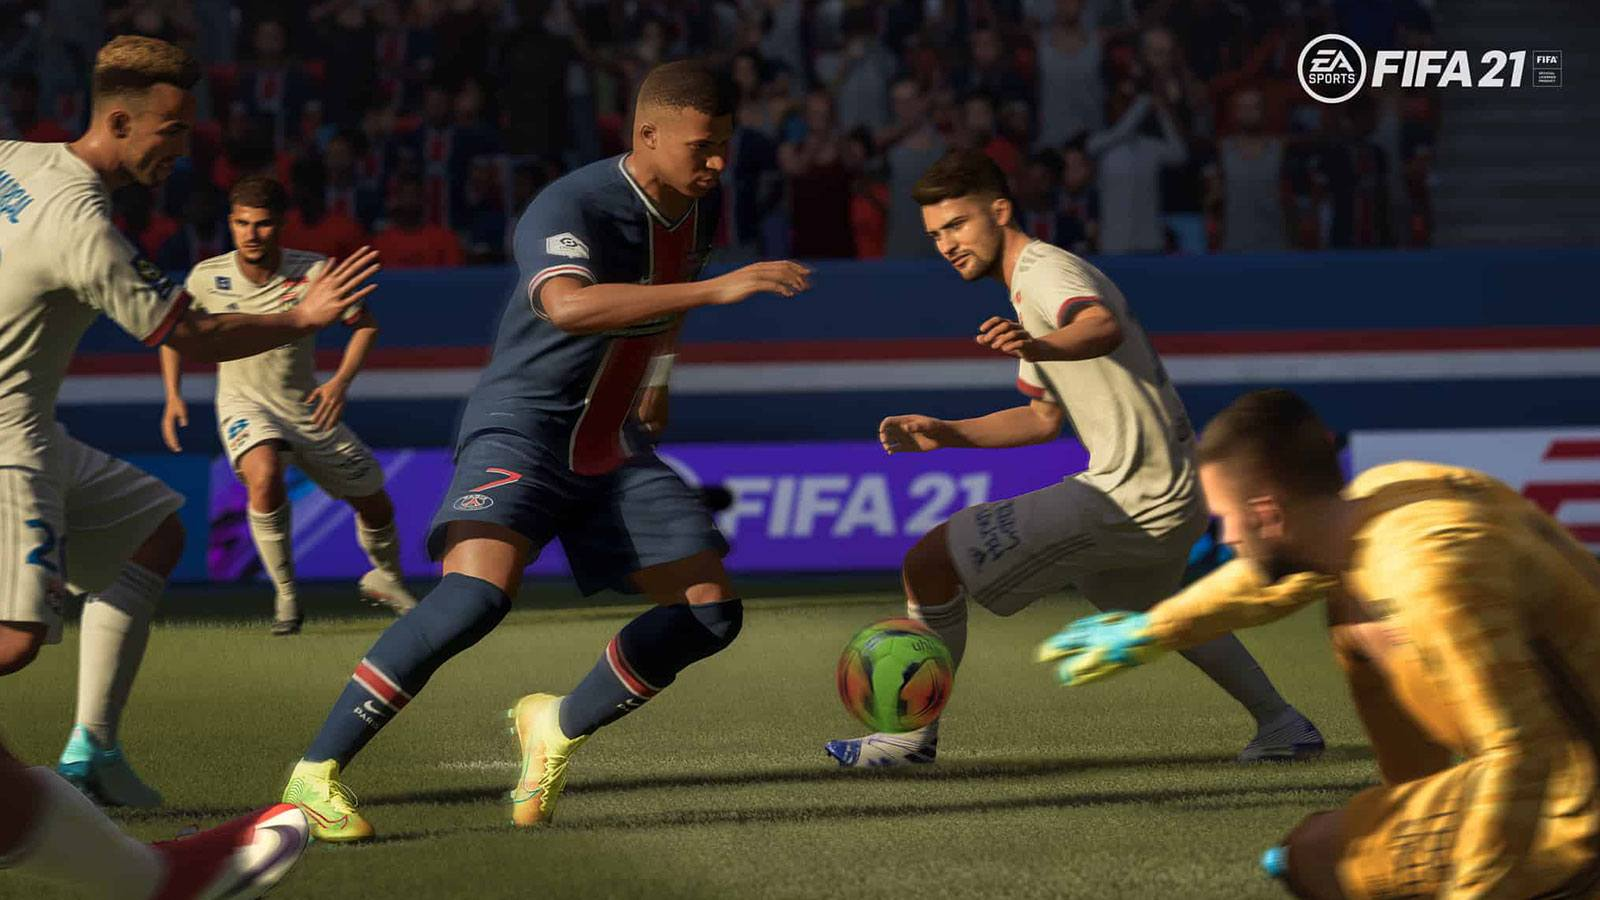 FIFA 21 Mbappe EA SPORTS